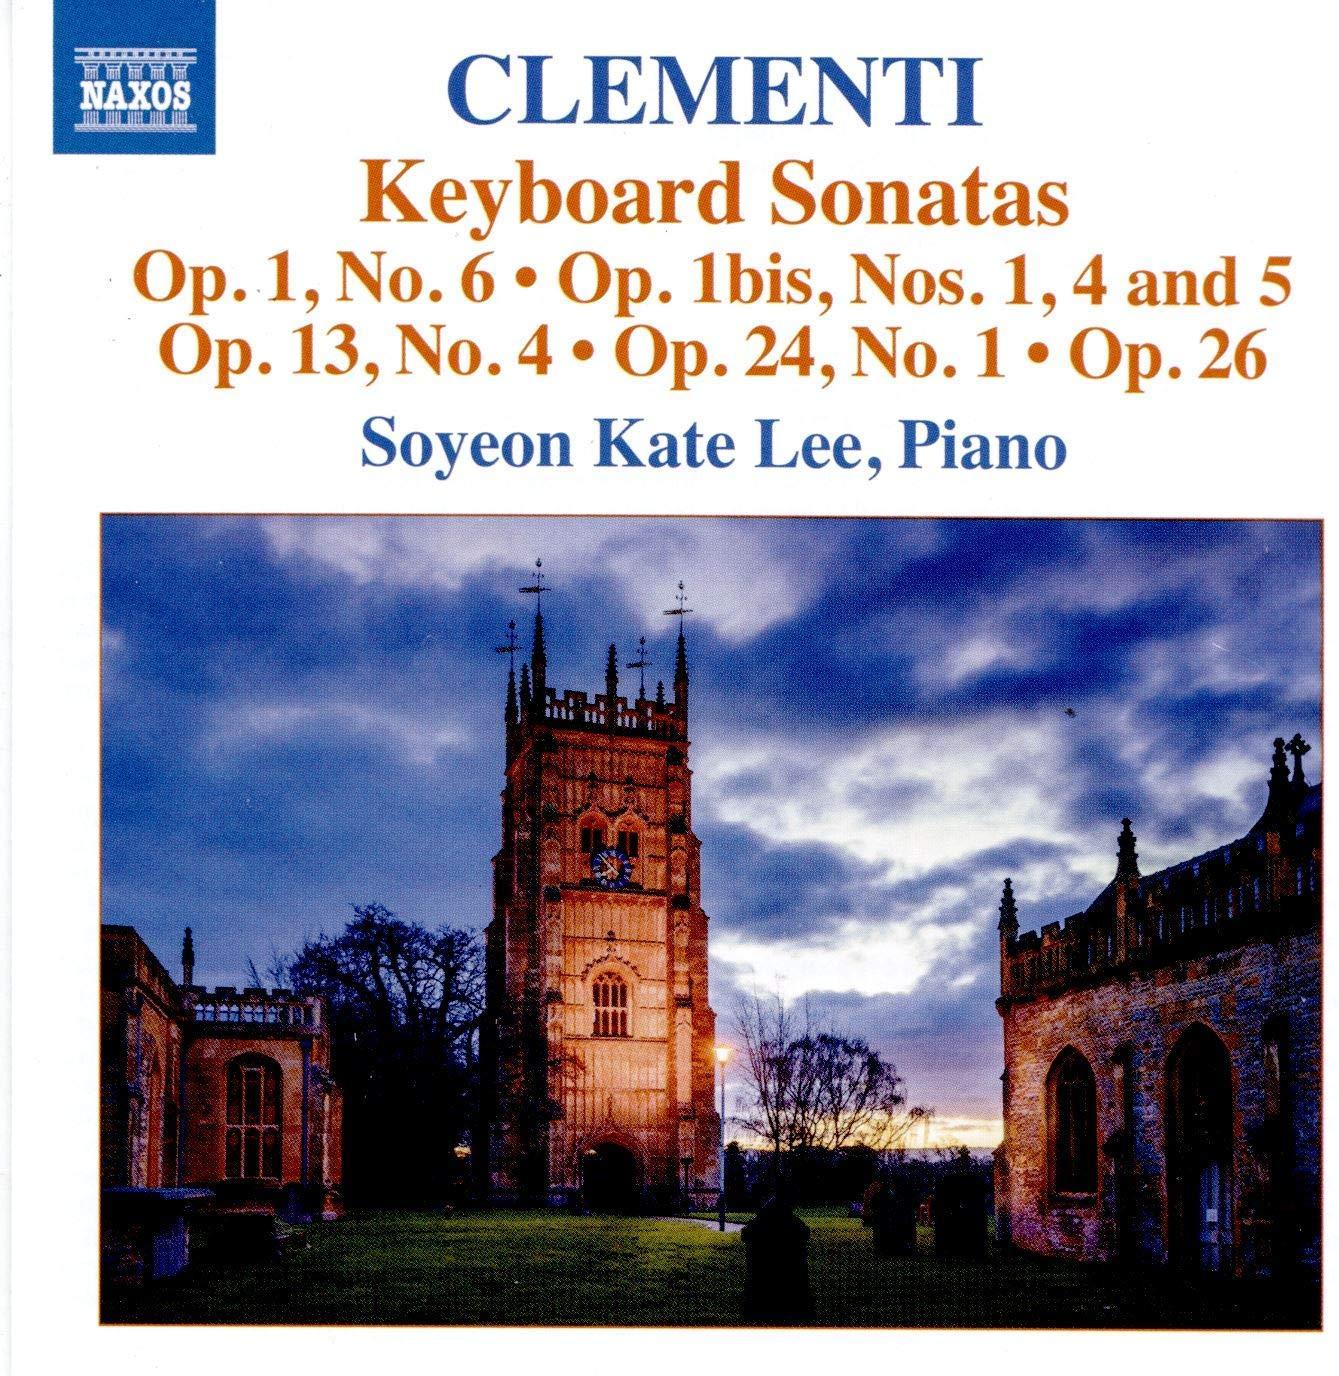 8573922. CLEMENTI Keyboard Sonatas Opp 1 & 13 (Soyeon Kate Lee)